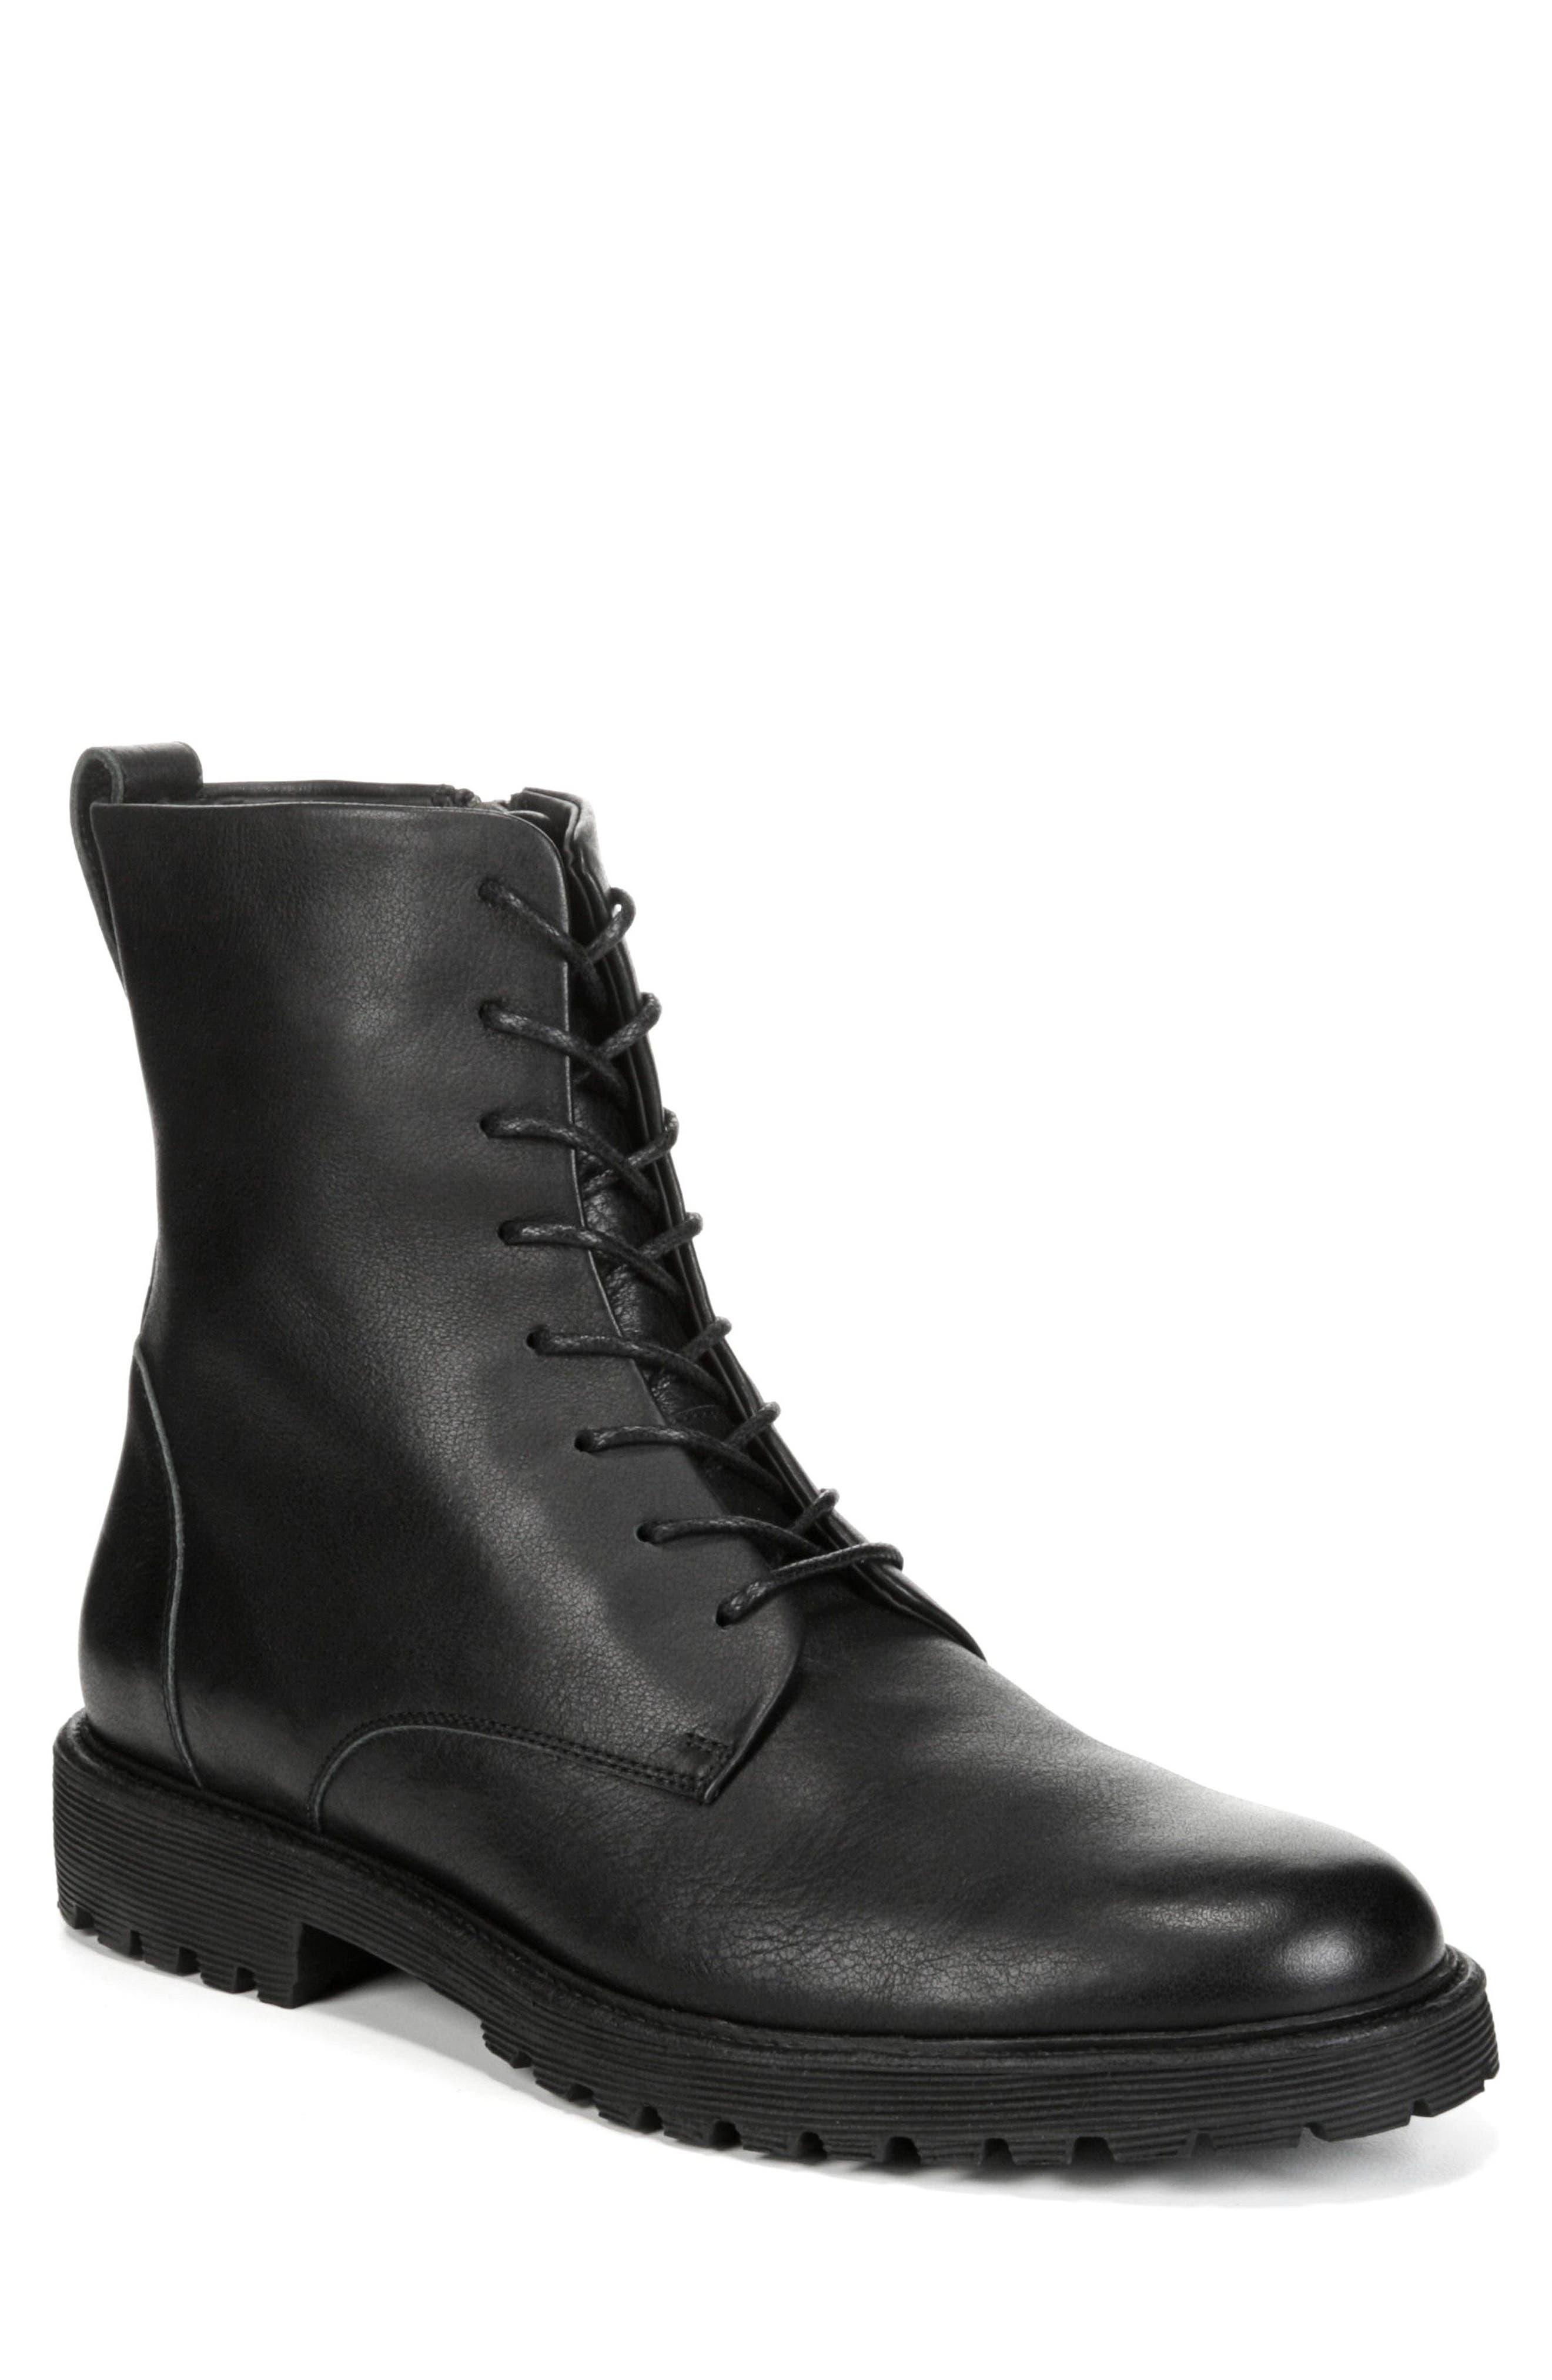 Brigade Plain Toe Boot,                         Main,                         color, 001